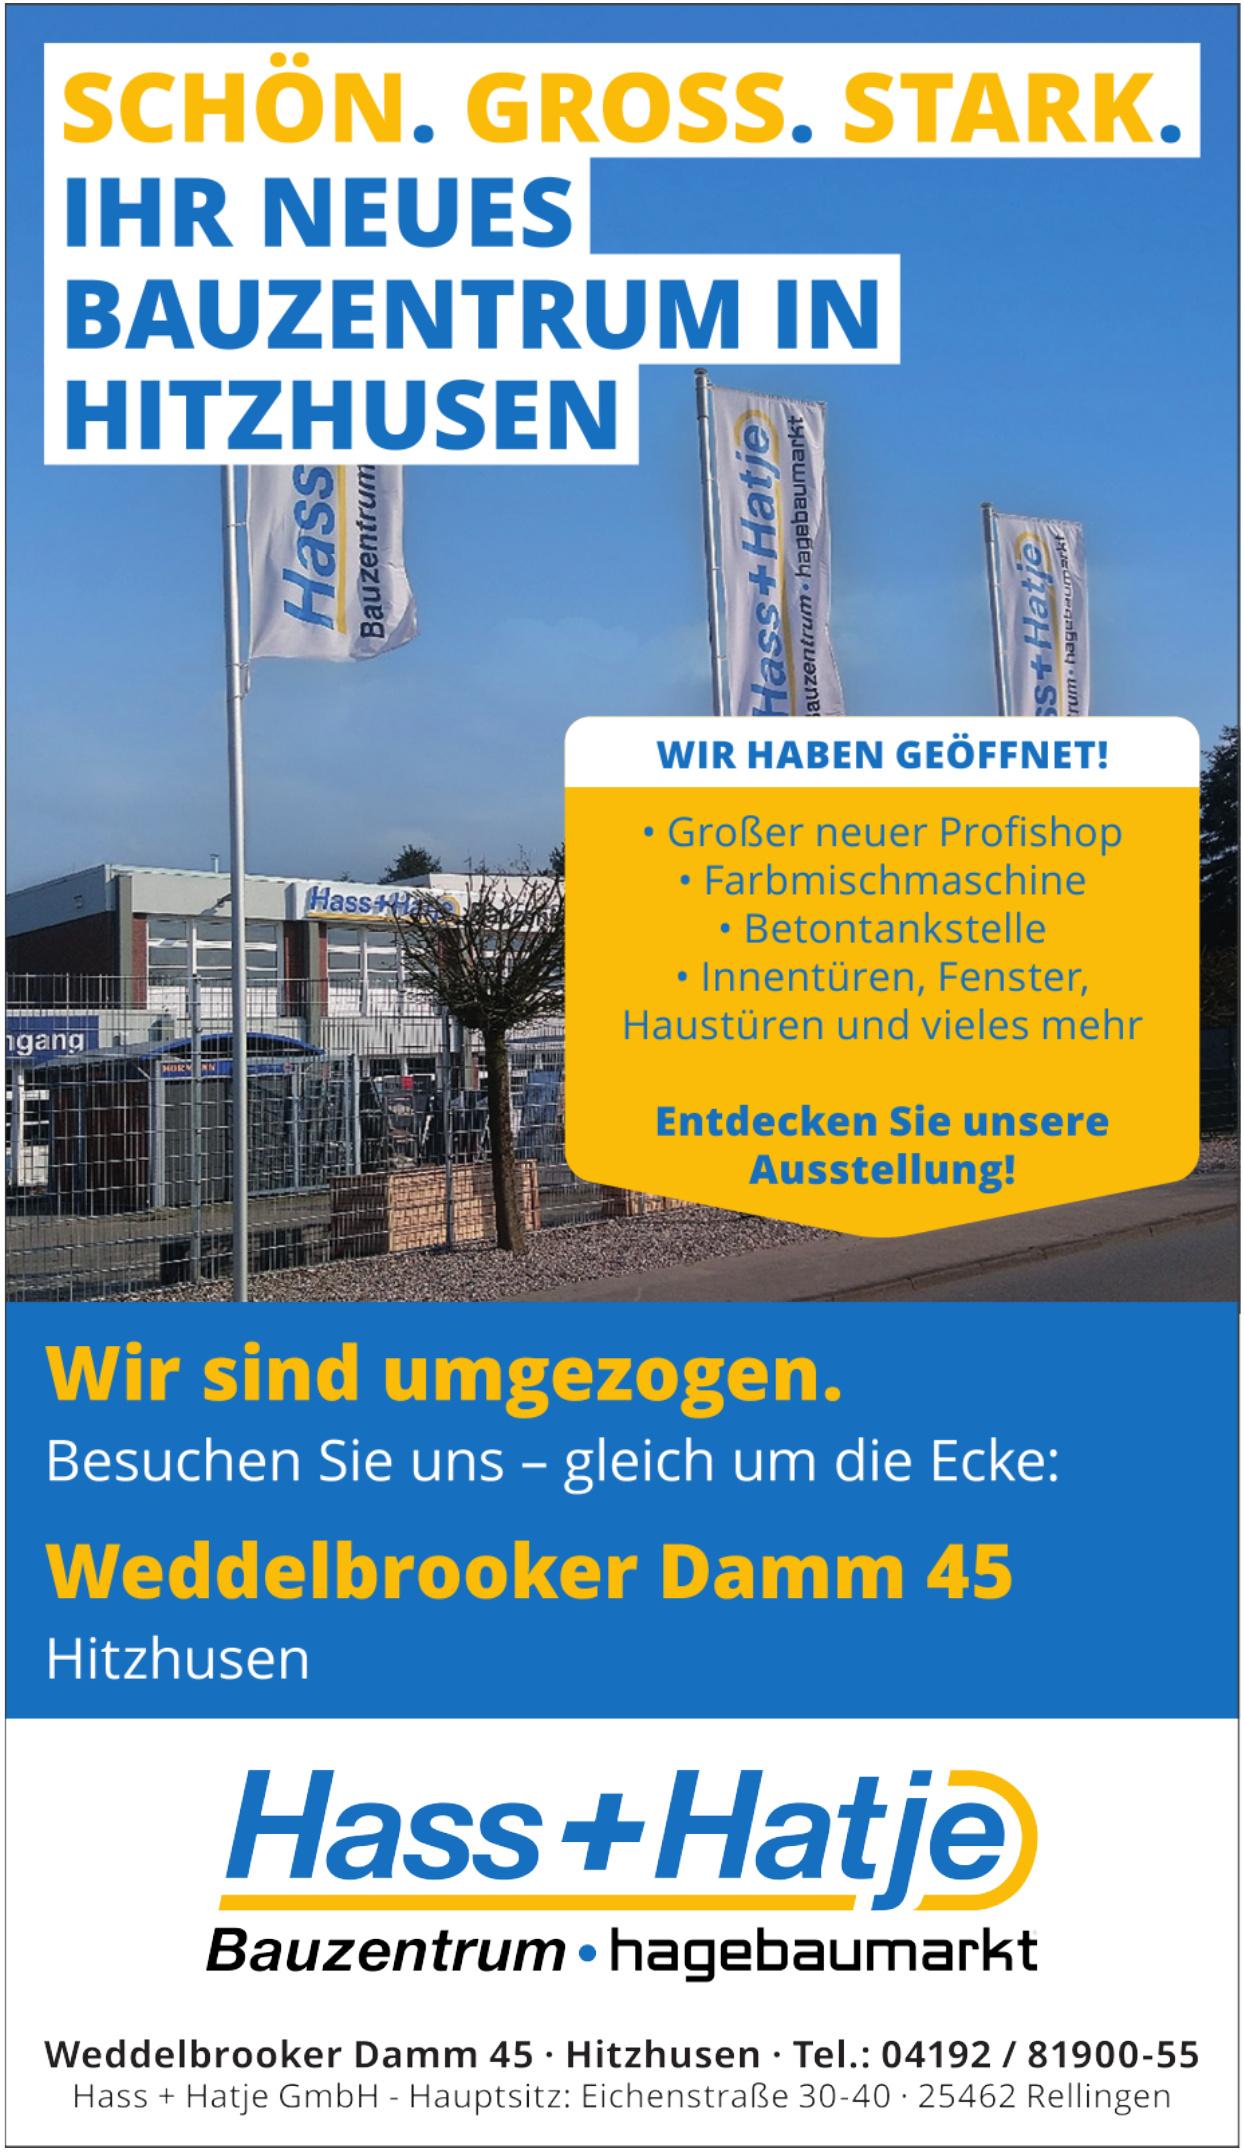 Hass + Hatje GmbH